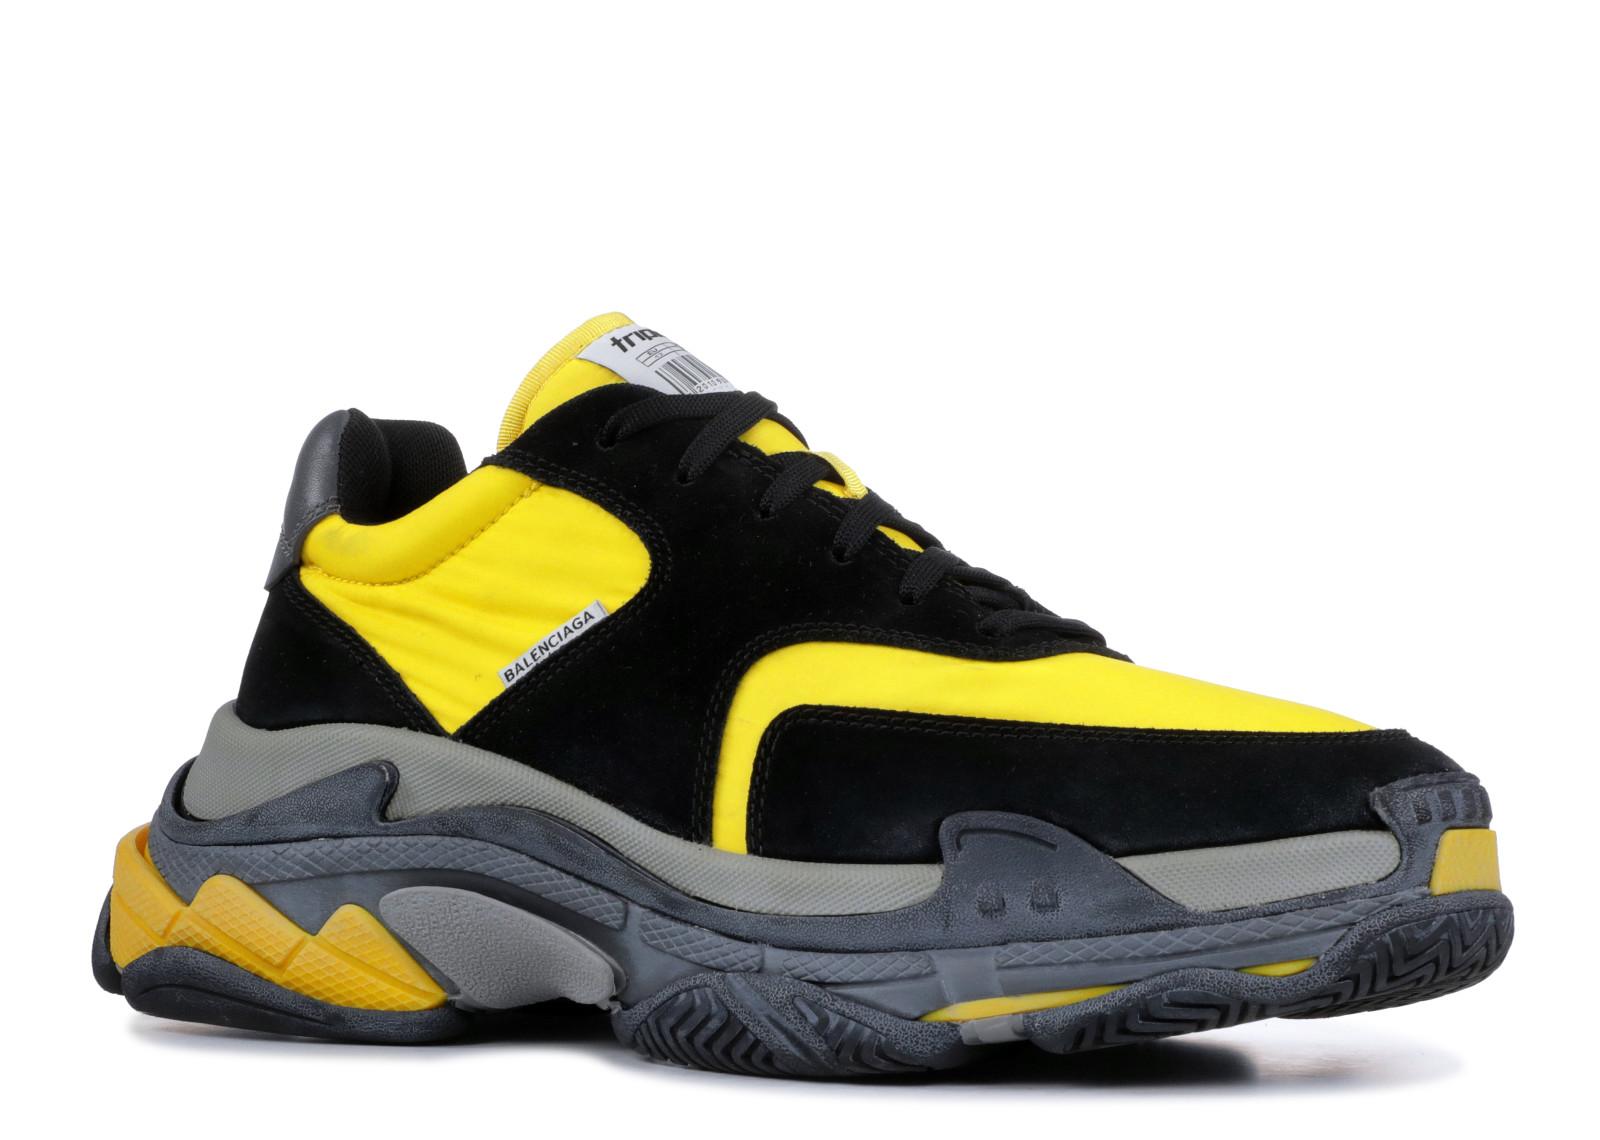 6bc67f4637b8 Balenciaga Triple S Black Yellow - 1